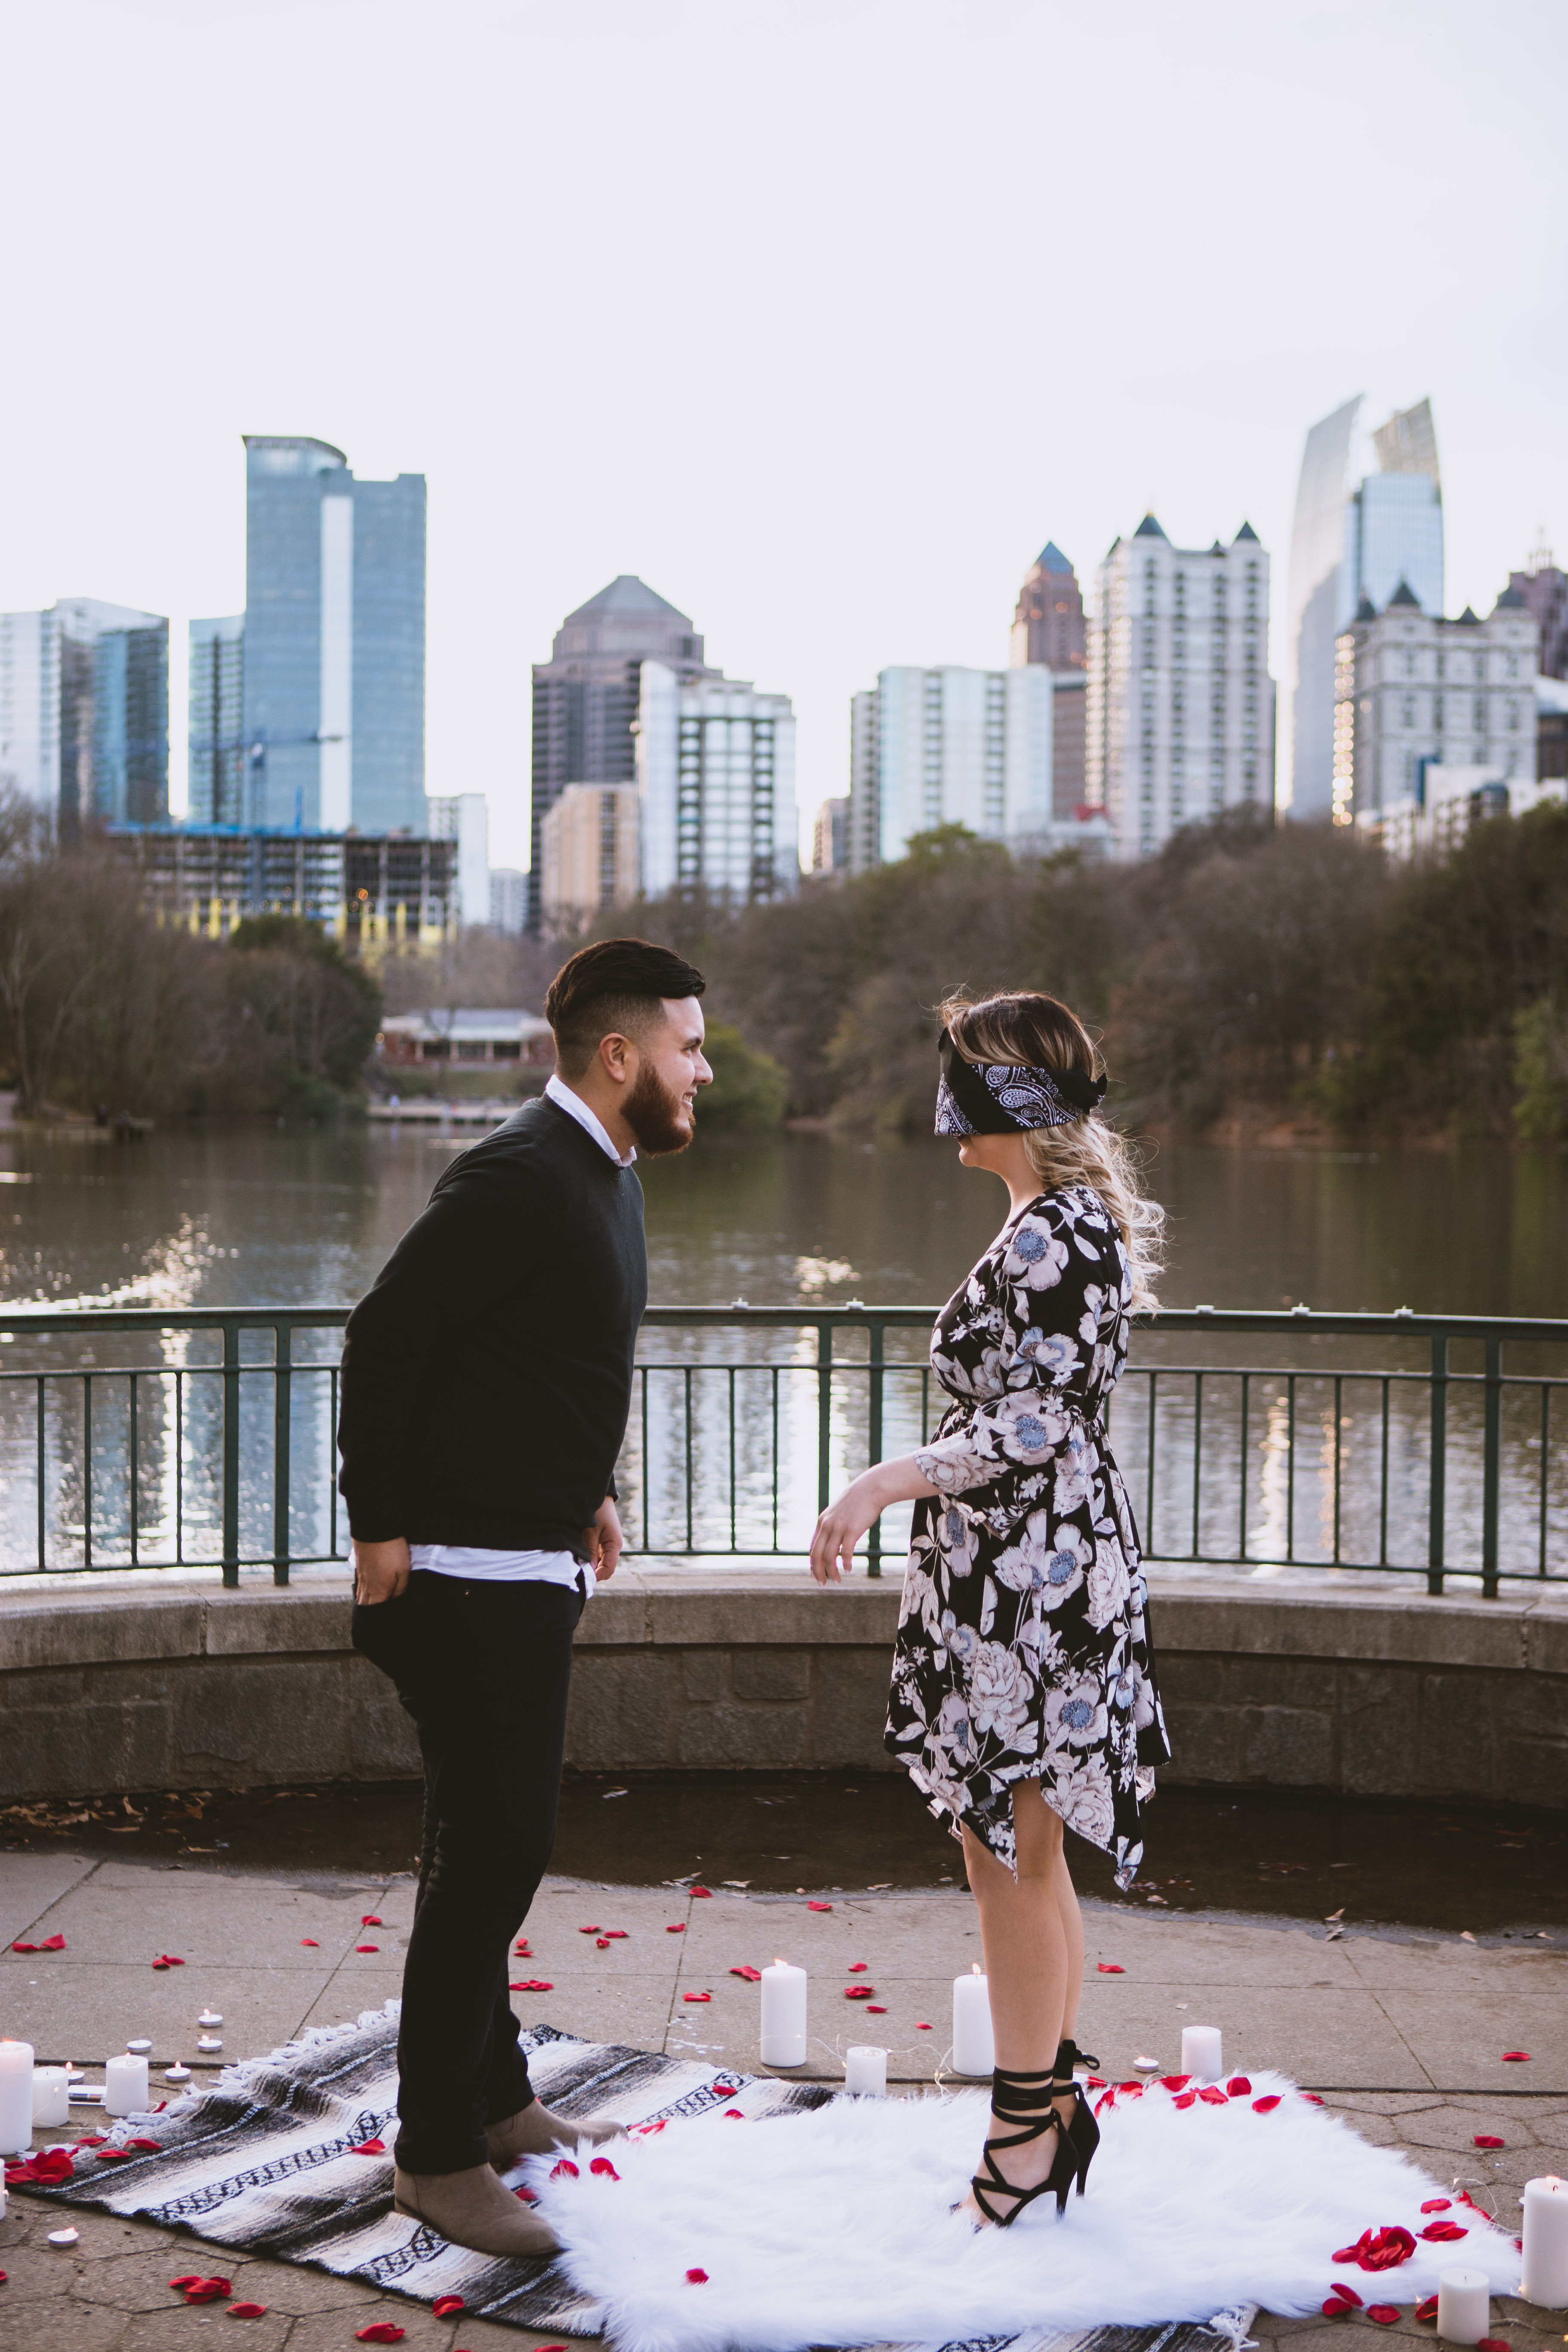 Keven & Micaela // Piedmont Park Atlanta, GA